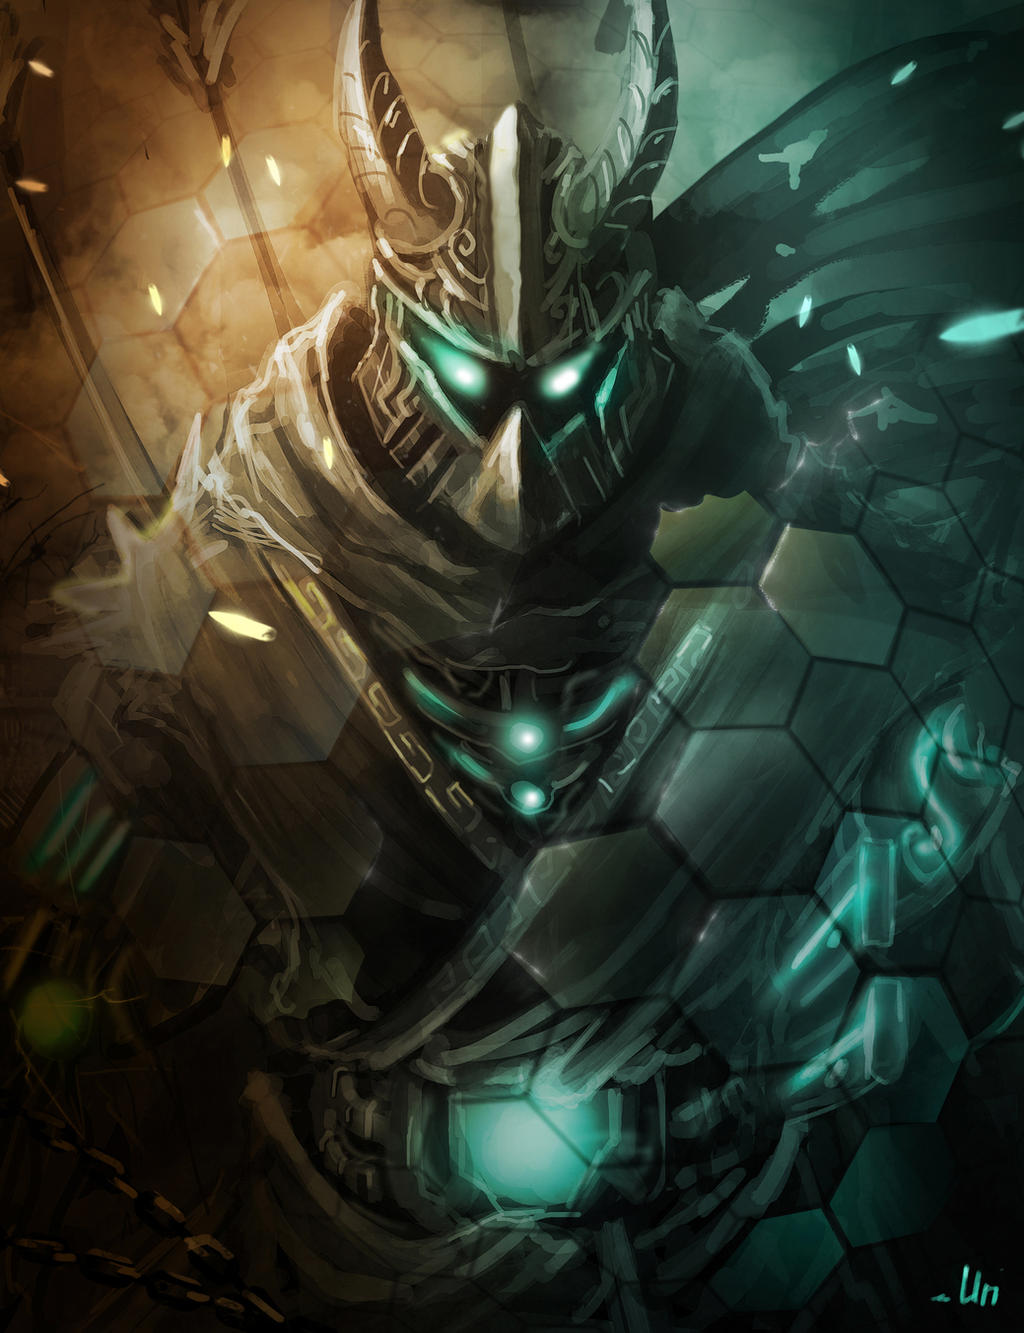 Cyborg ninja by jurrig